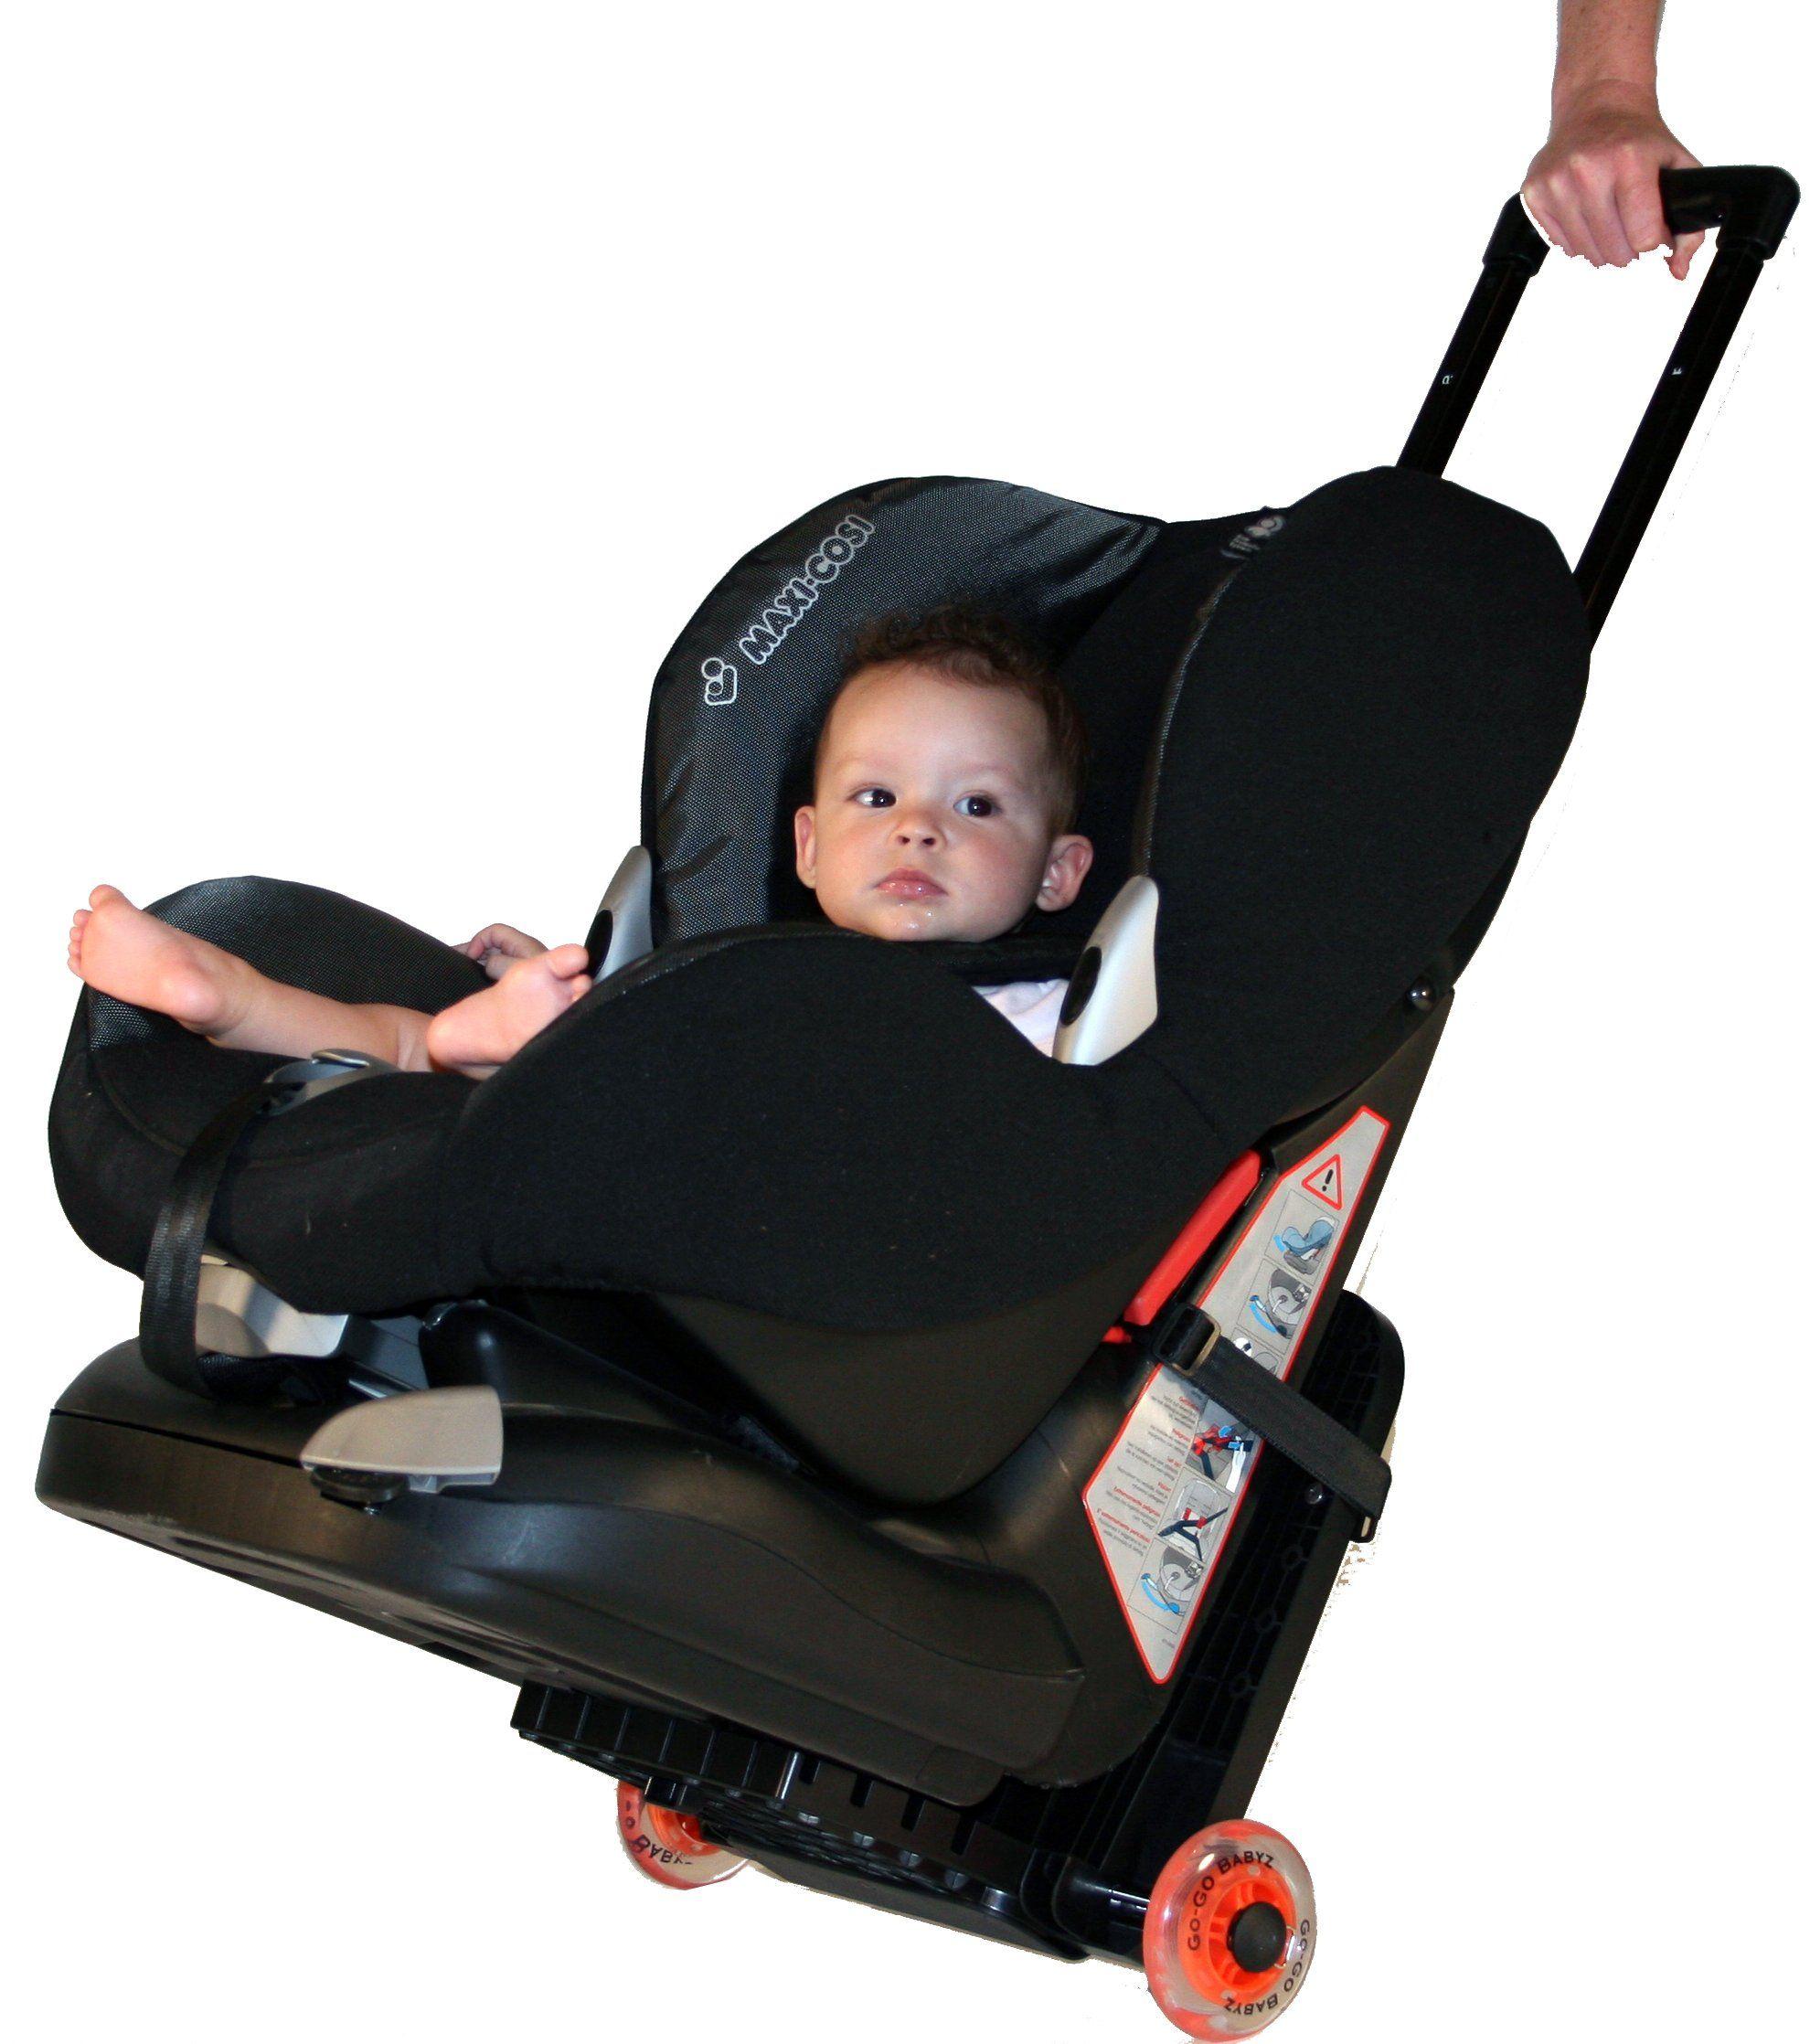 Amazon.com : GO-GO BABYZ TRAVELMATE Car Seat Travel Stroller for ...